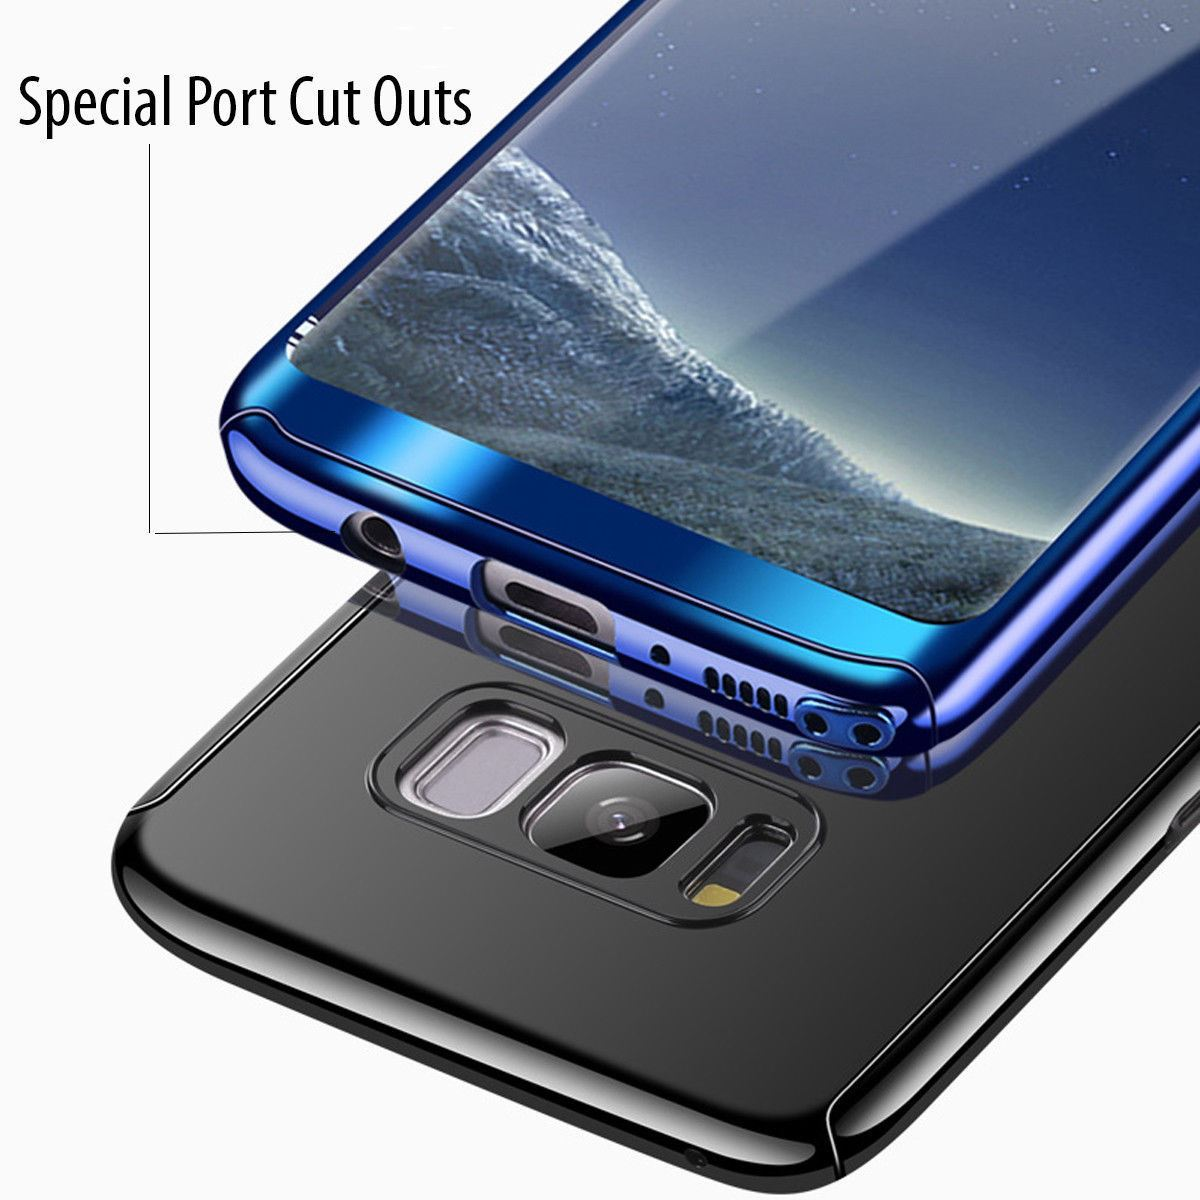 Shockproof-Hybrid-360-Ultra-Thin-Mirror-Hard-Case-Samsung-Galaxy-S7-edge-S8-S9 thumbnail 18